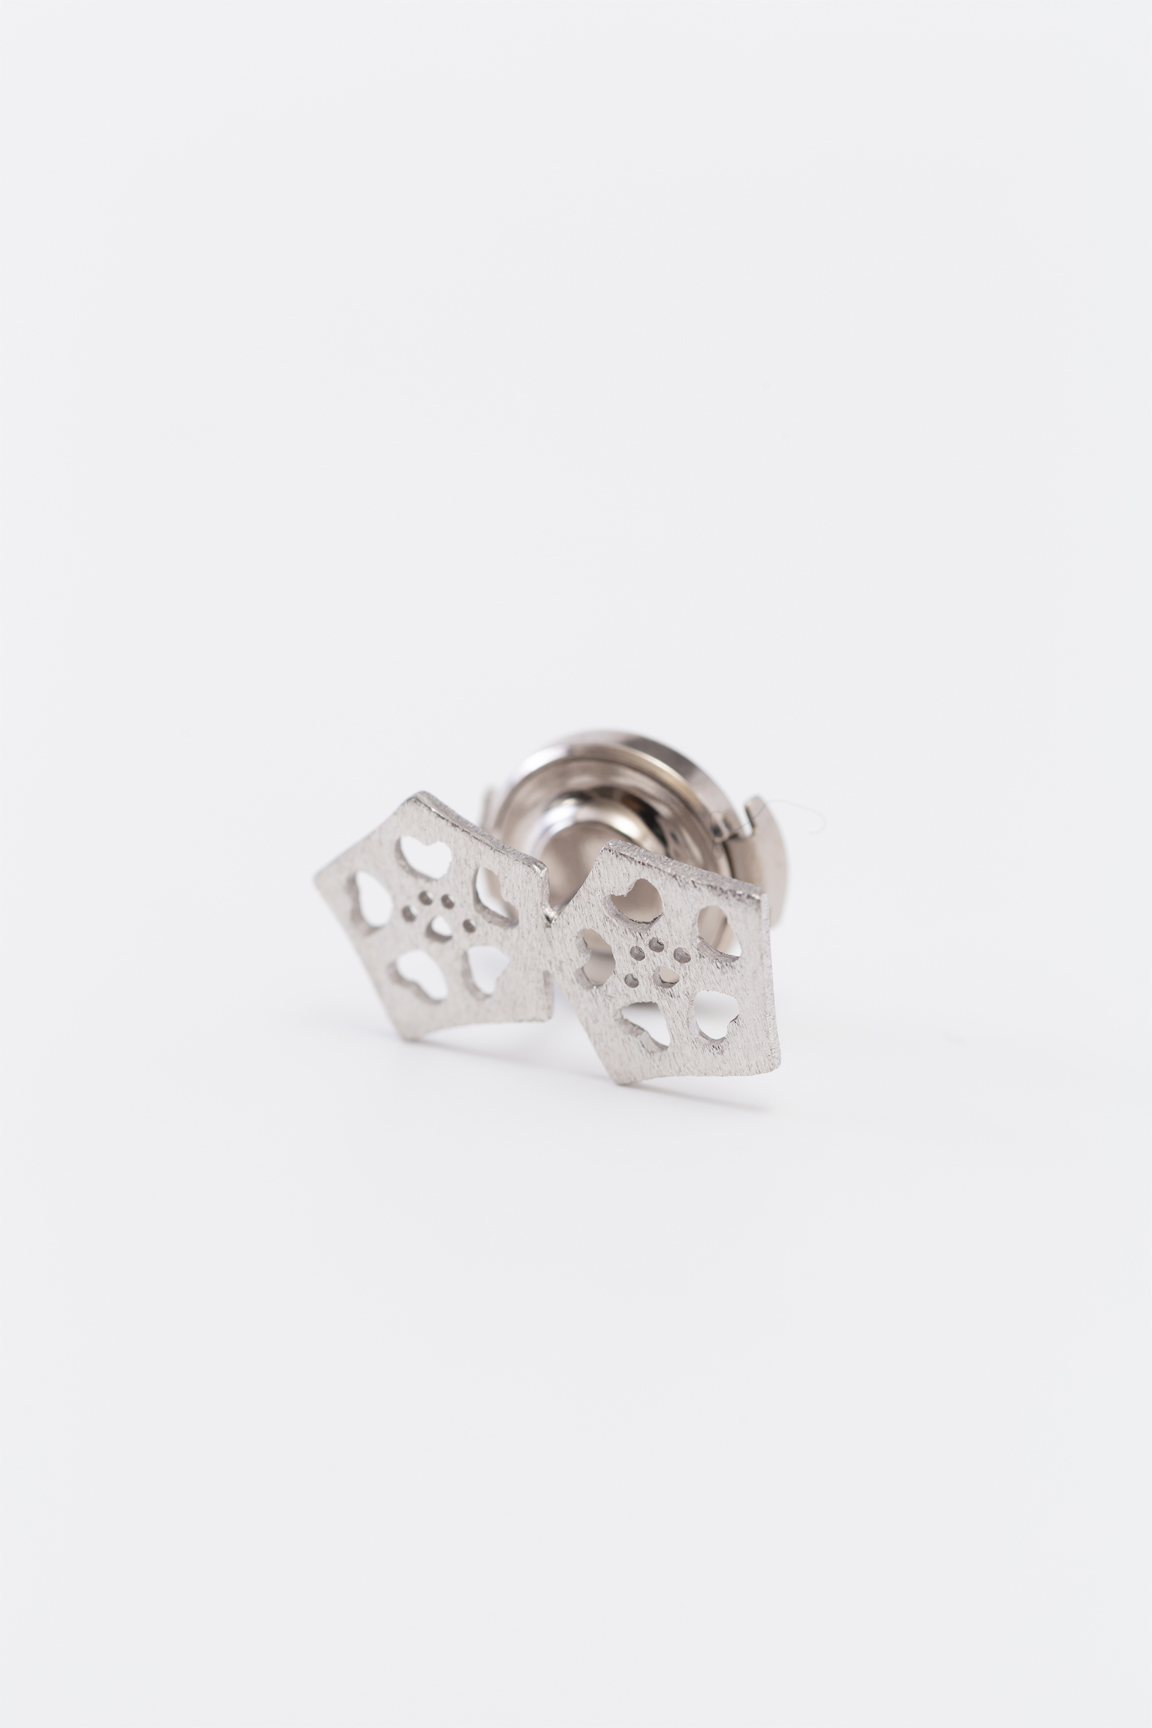 Okra_pad pin broach(silver) (2Okra)